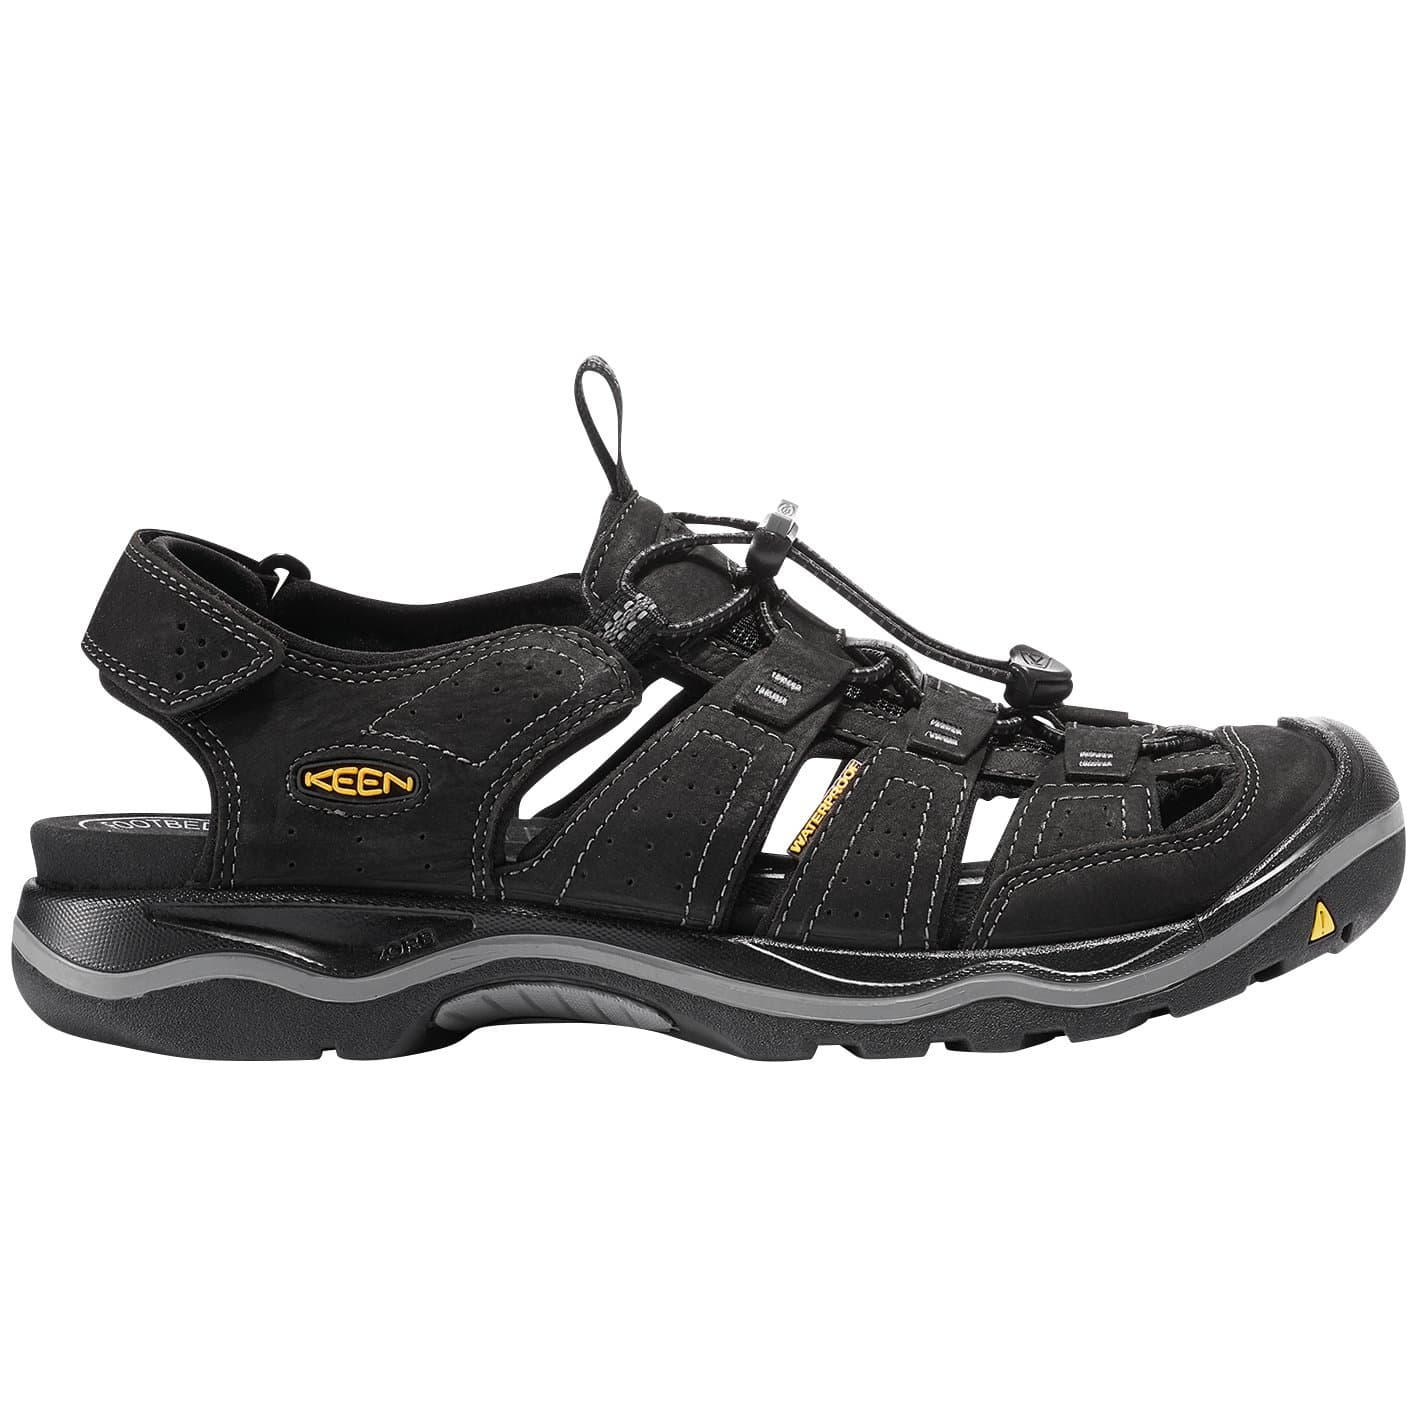 Keen Rialto II Sandali da uomo